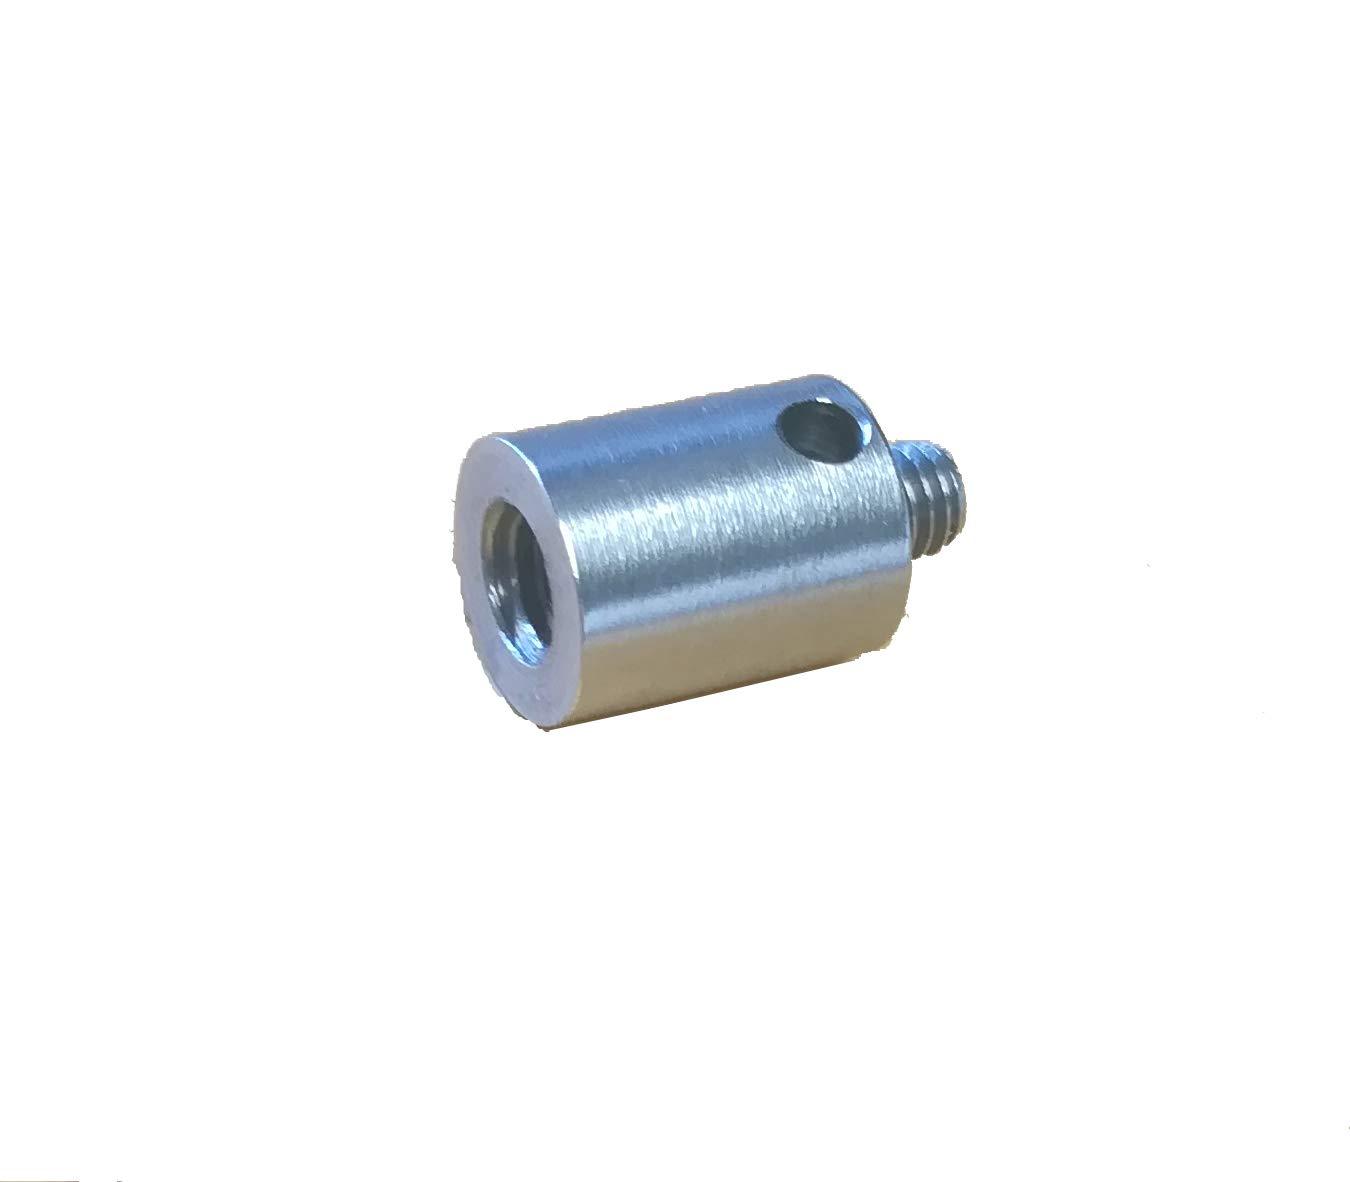 CMM Probe Thread Adapter M3 Outer Thread Shank To M4 Inner Thread